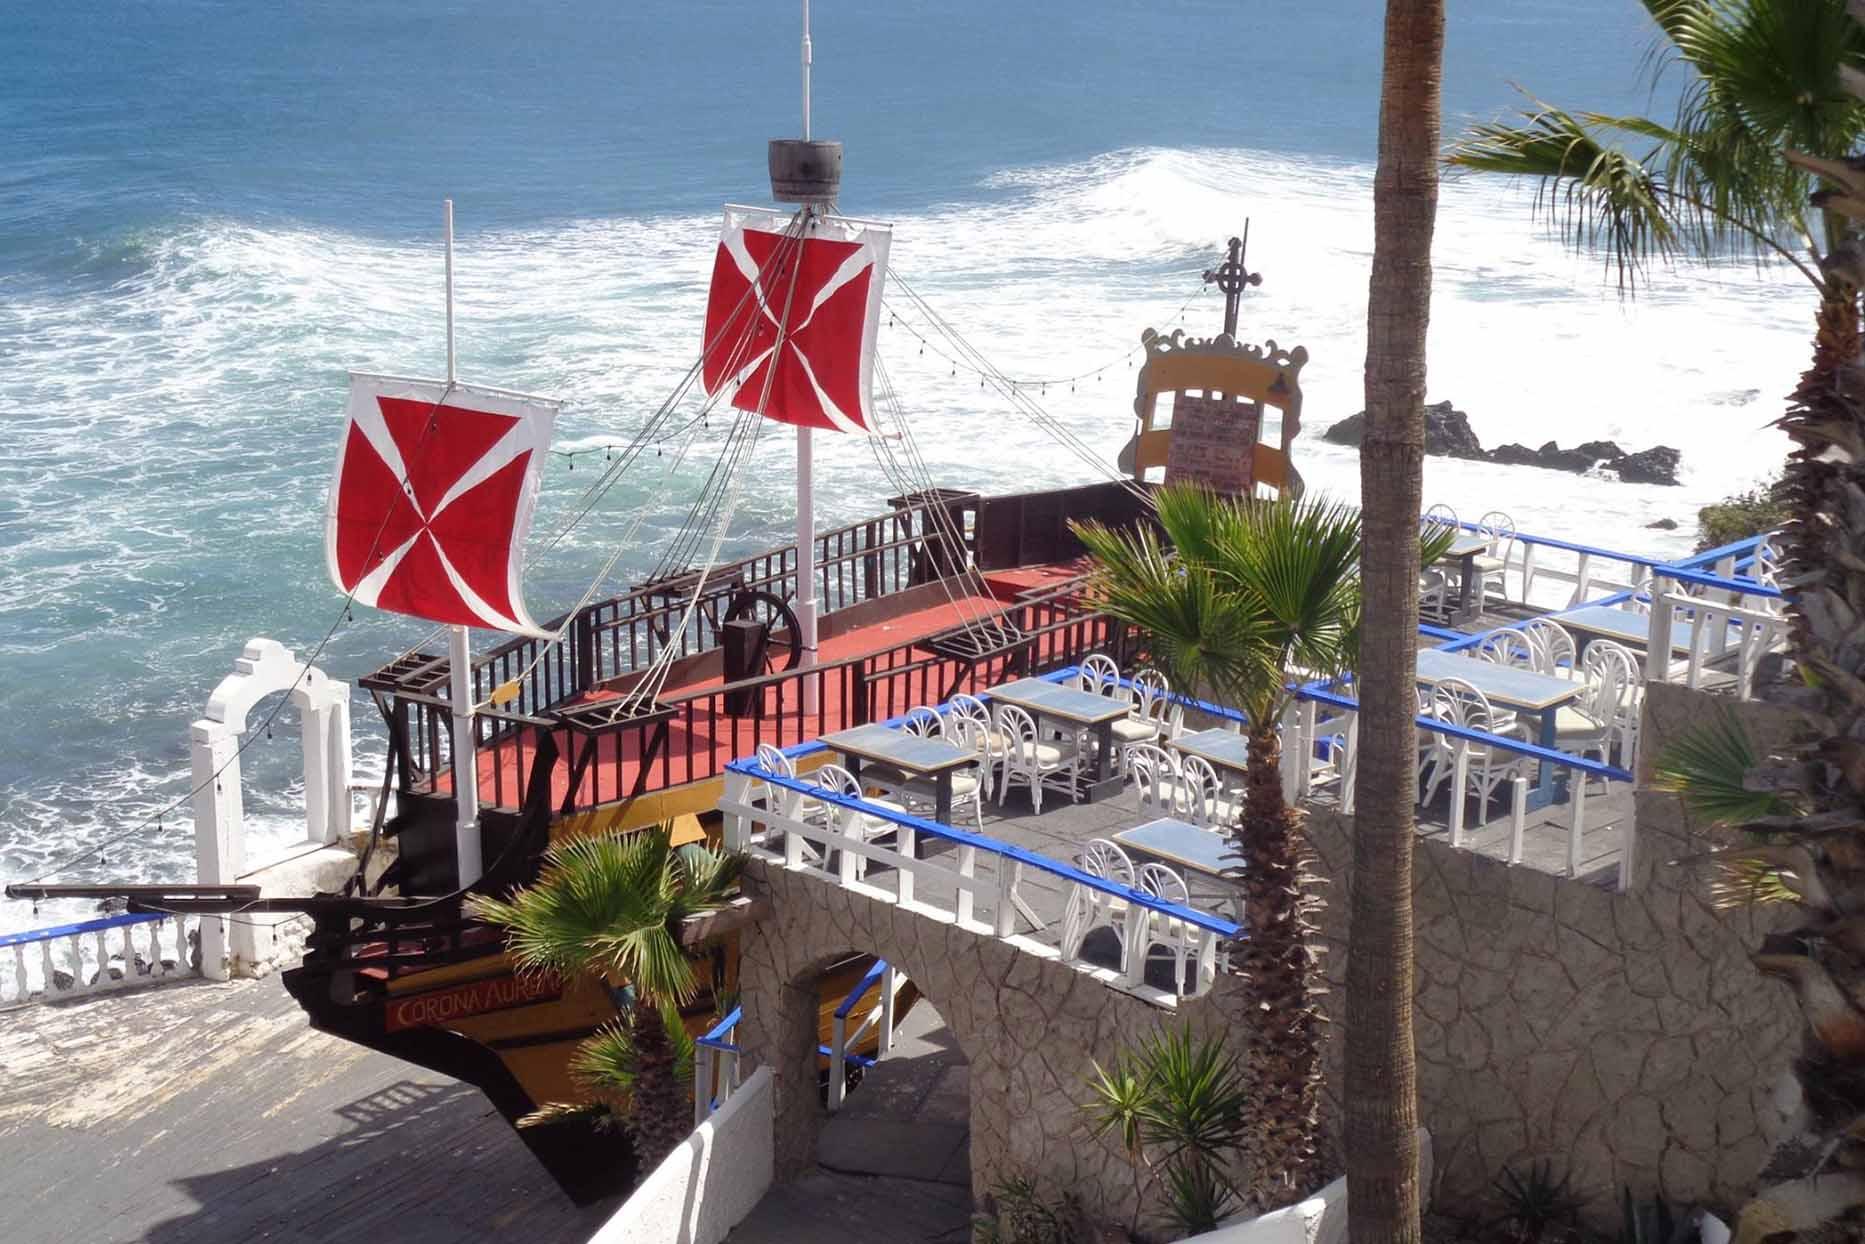 Hotel Calafia Barco